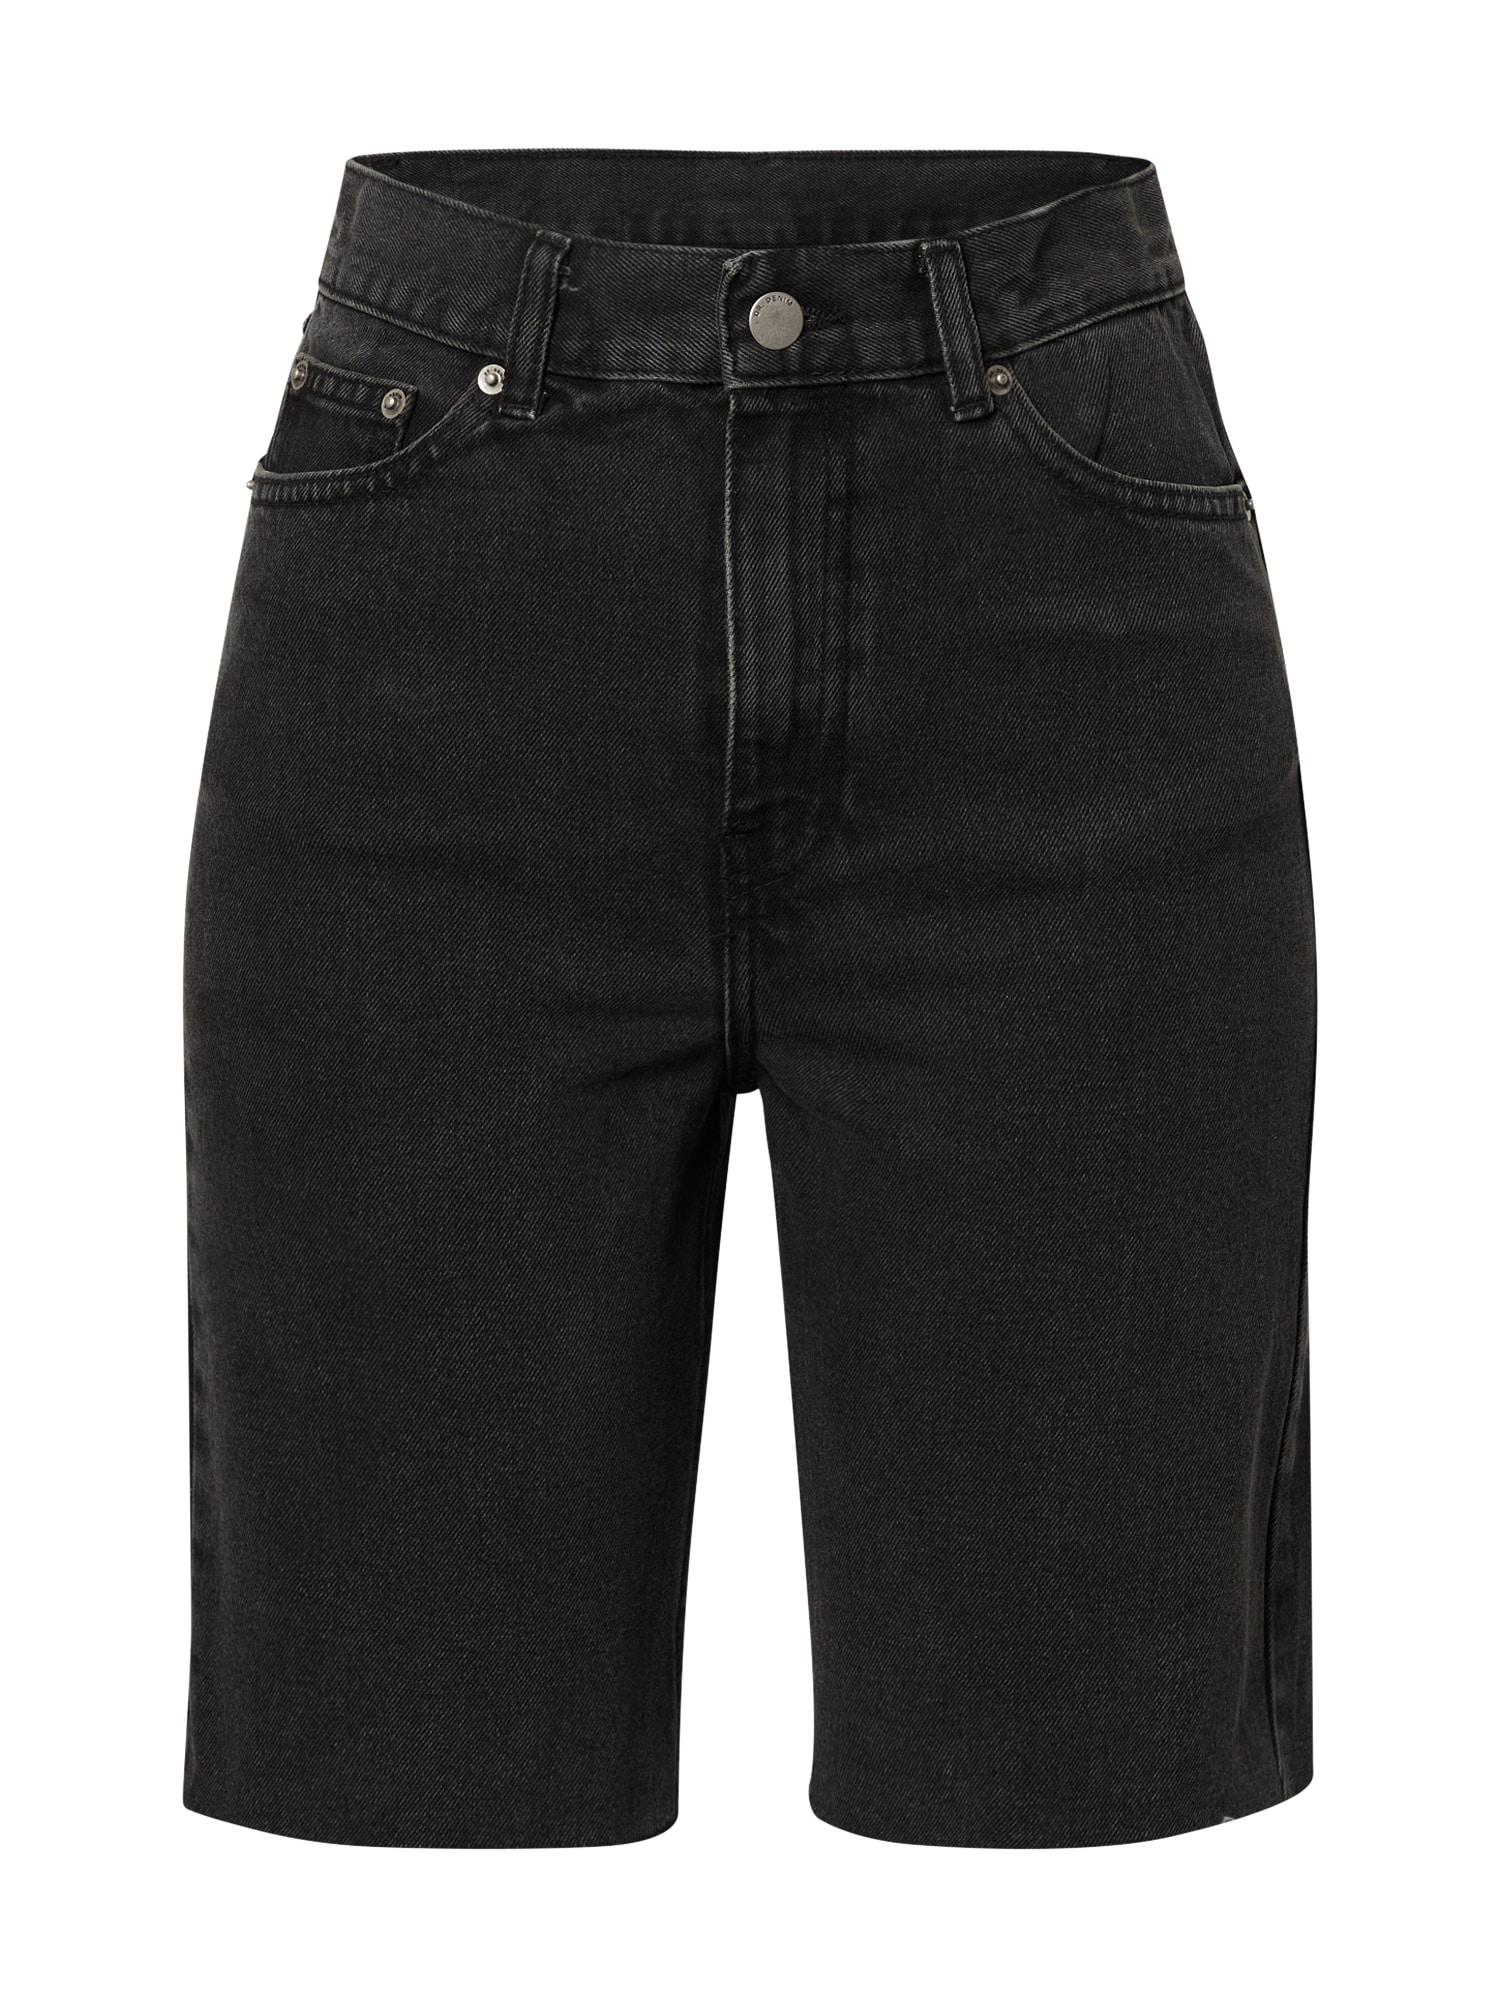 Dr. Denim Džinsai juodo džinso spalva